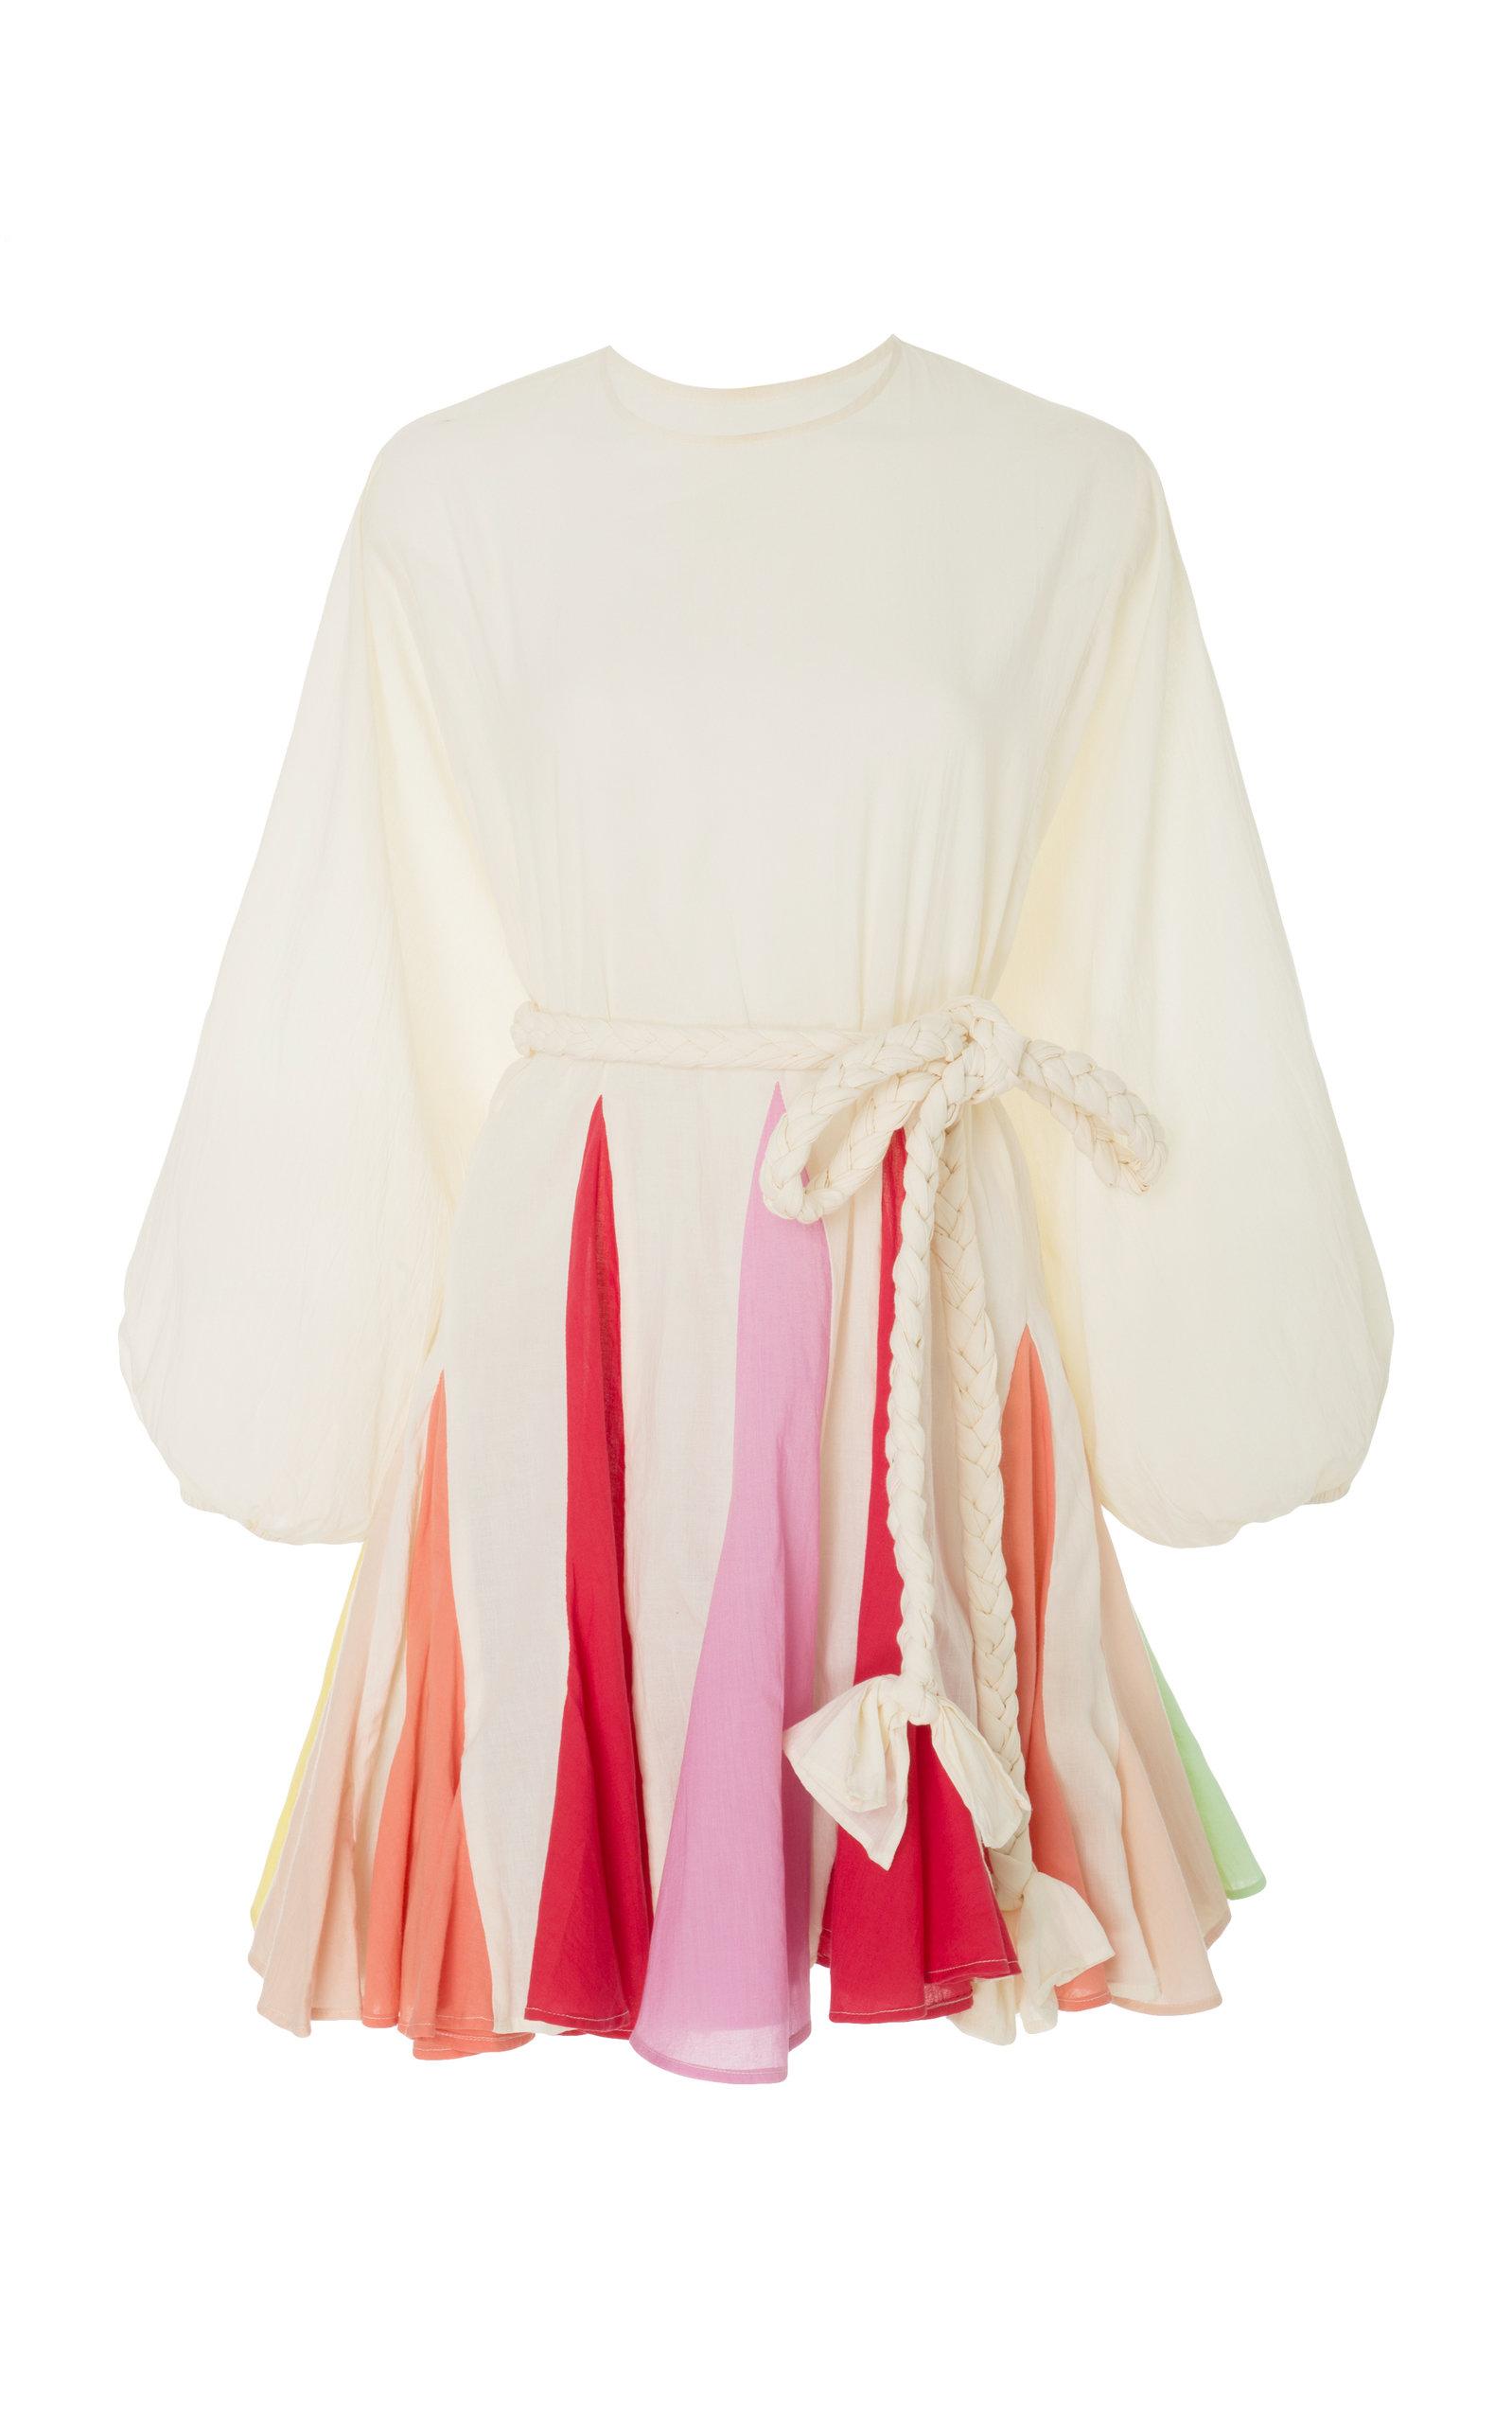 Rhode Resort Ella Belted Color-Block Cotton-Voile Mini Dress In Rainbow Color Block